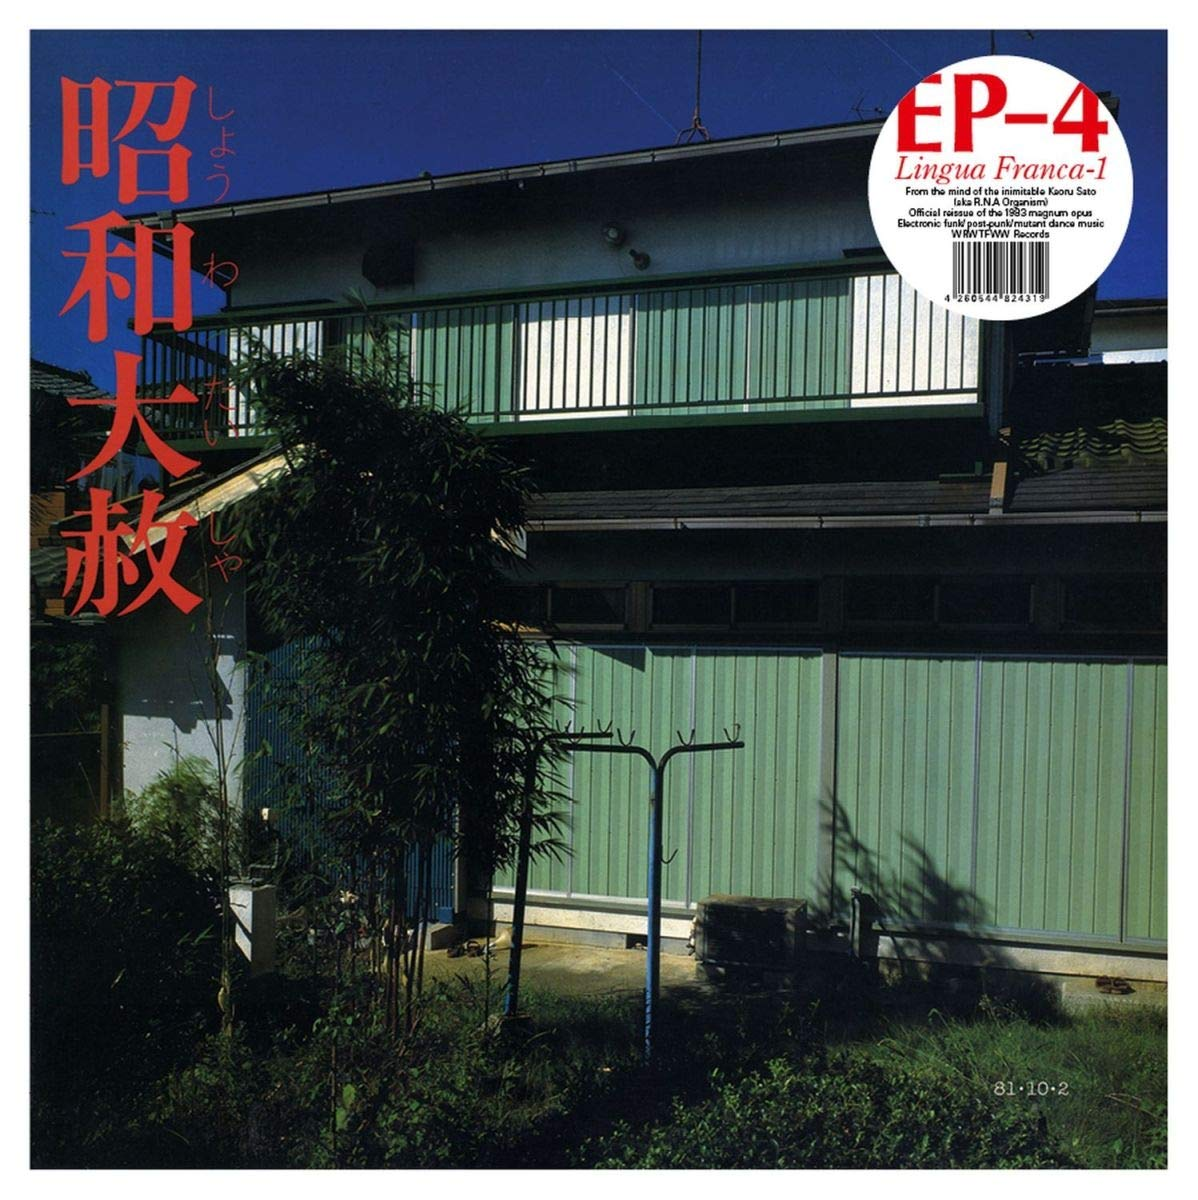 Vinilo : Ep-4 - Lingua Franca 1 (LP Vinyl)